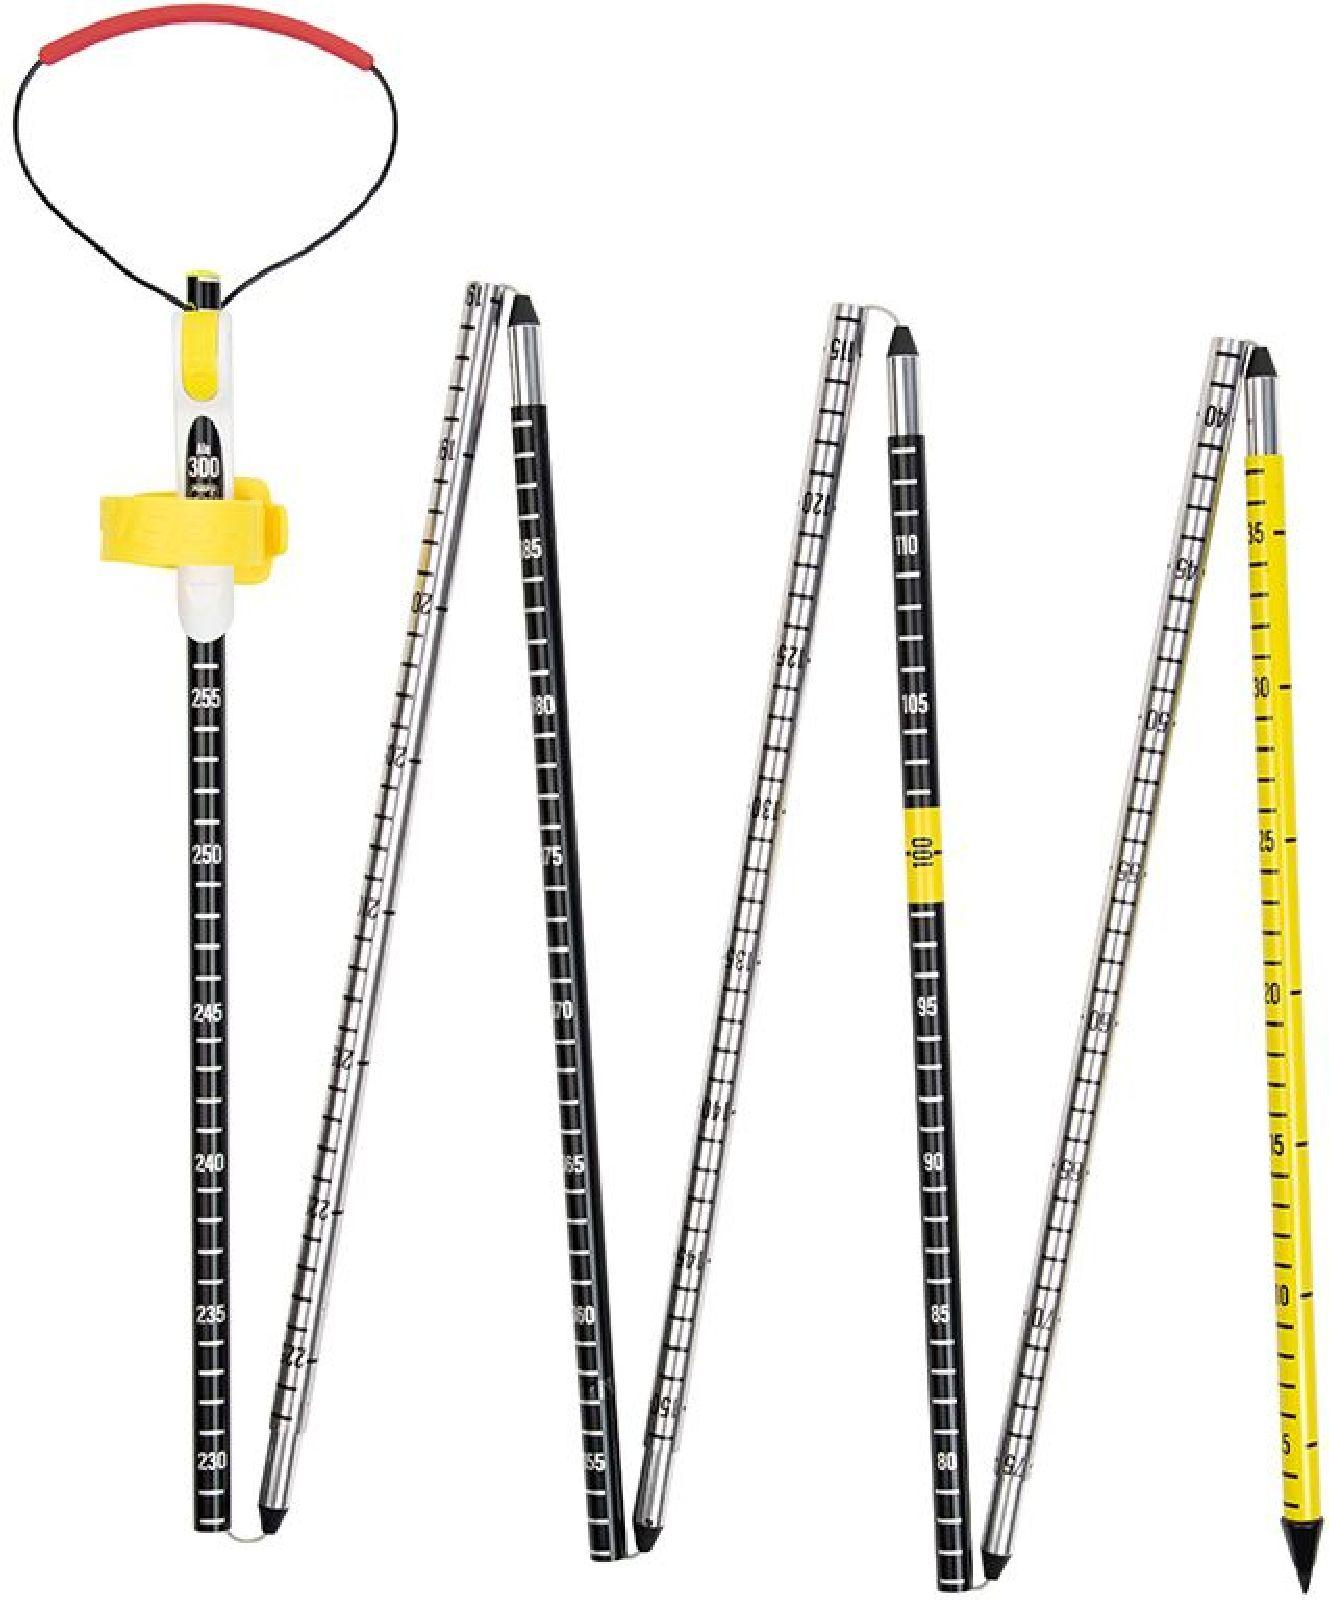 Pieps Probe Alu 300 Sport - black/silver/yellow uni